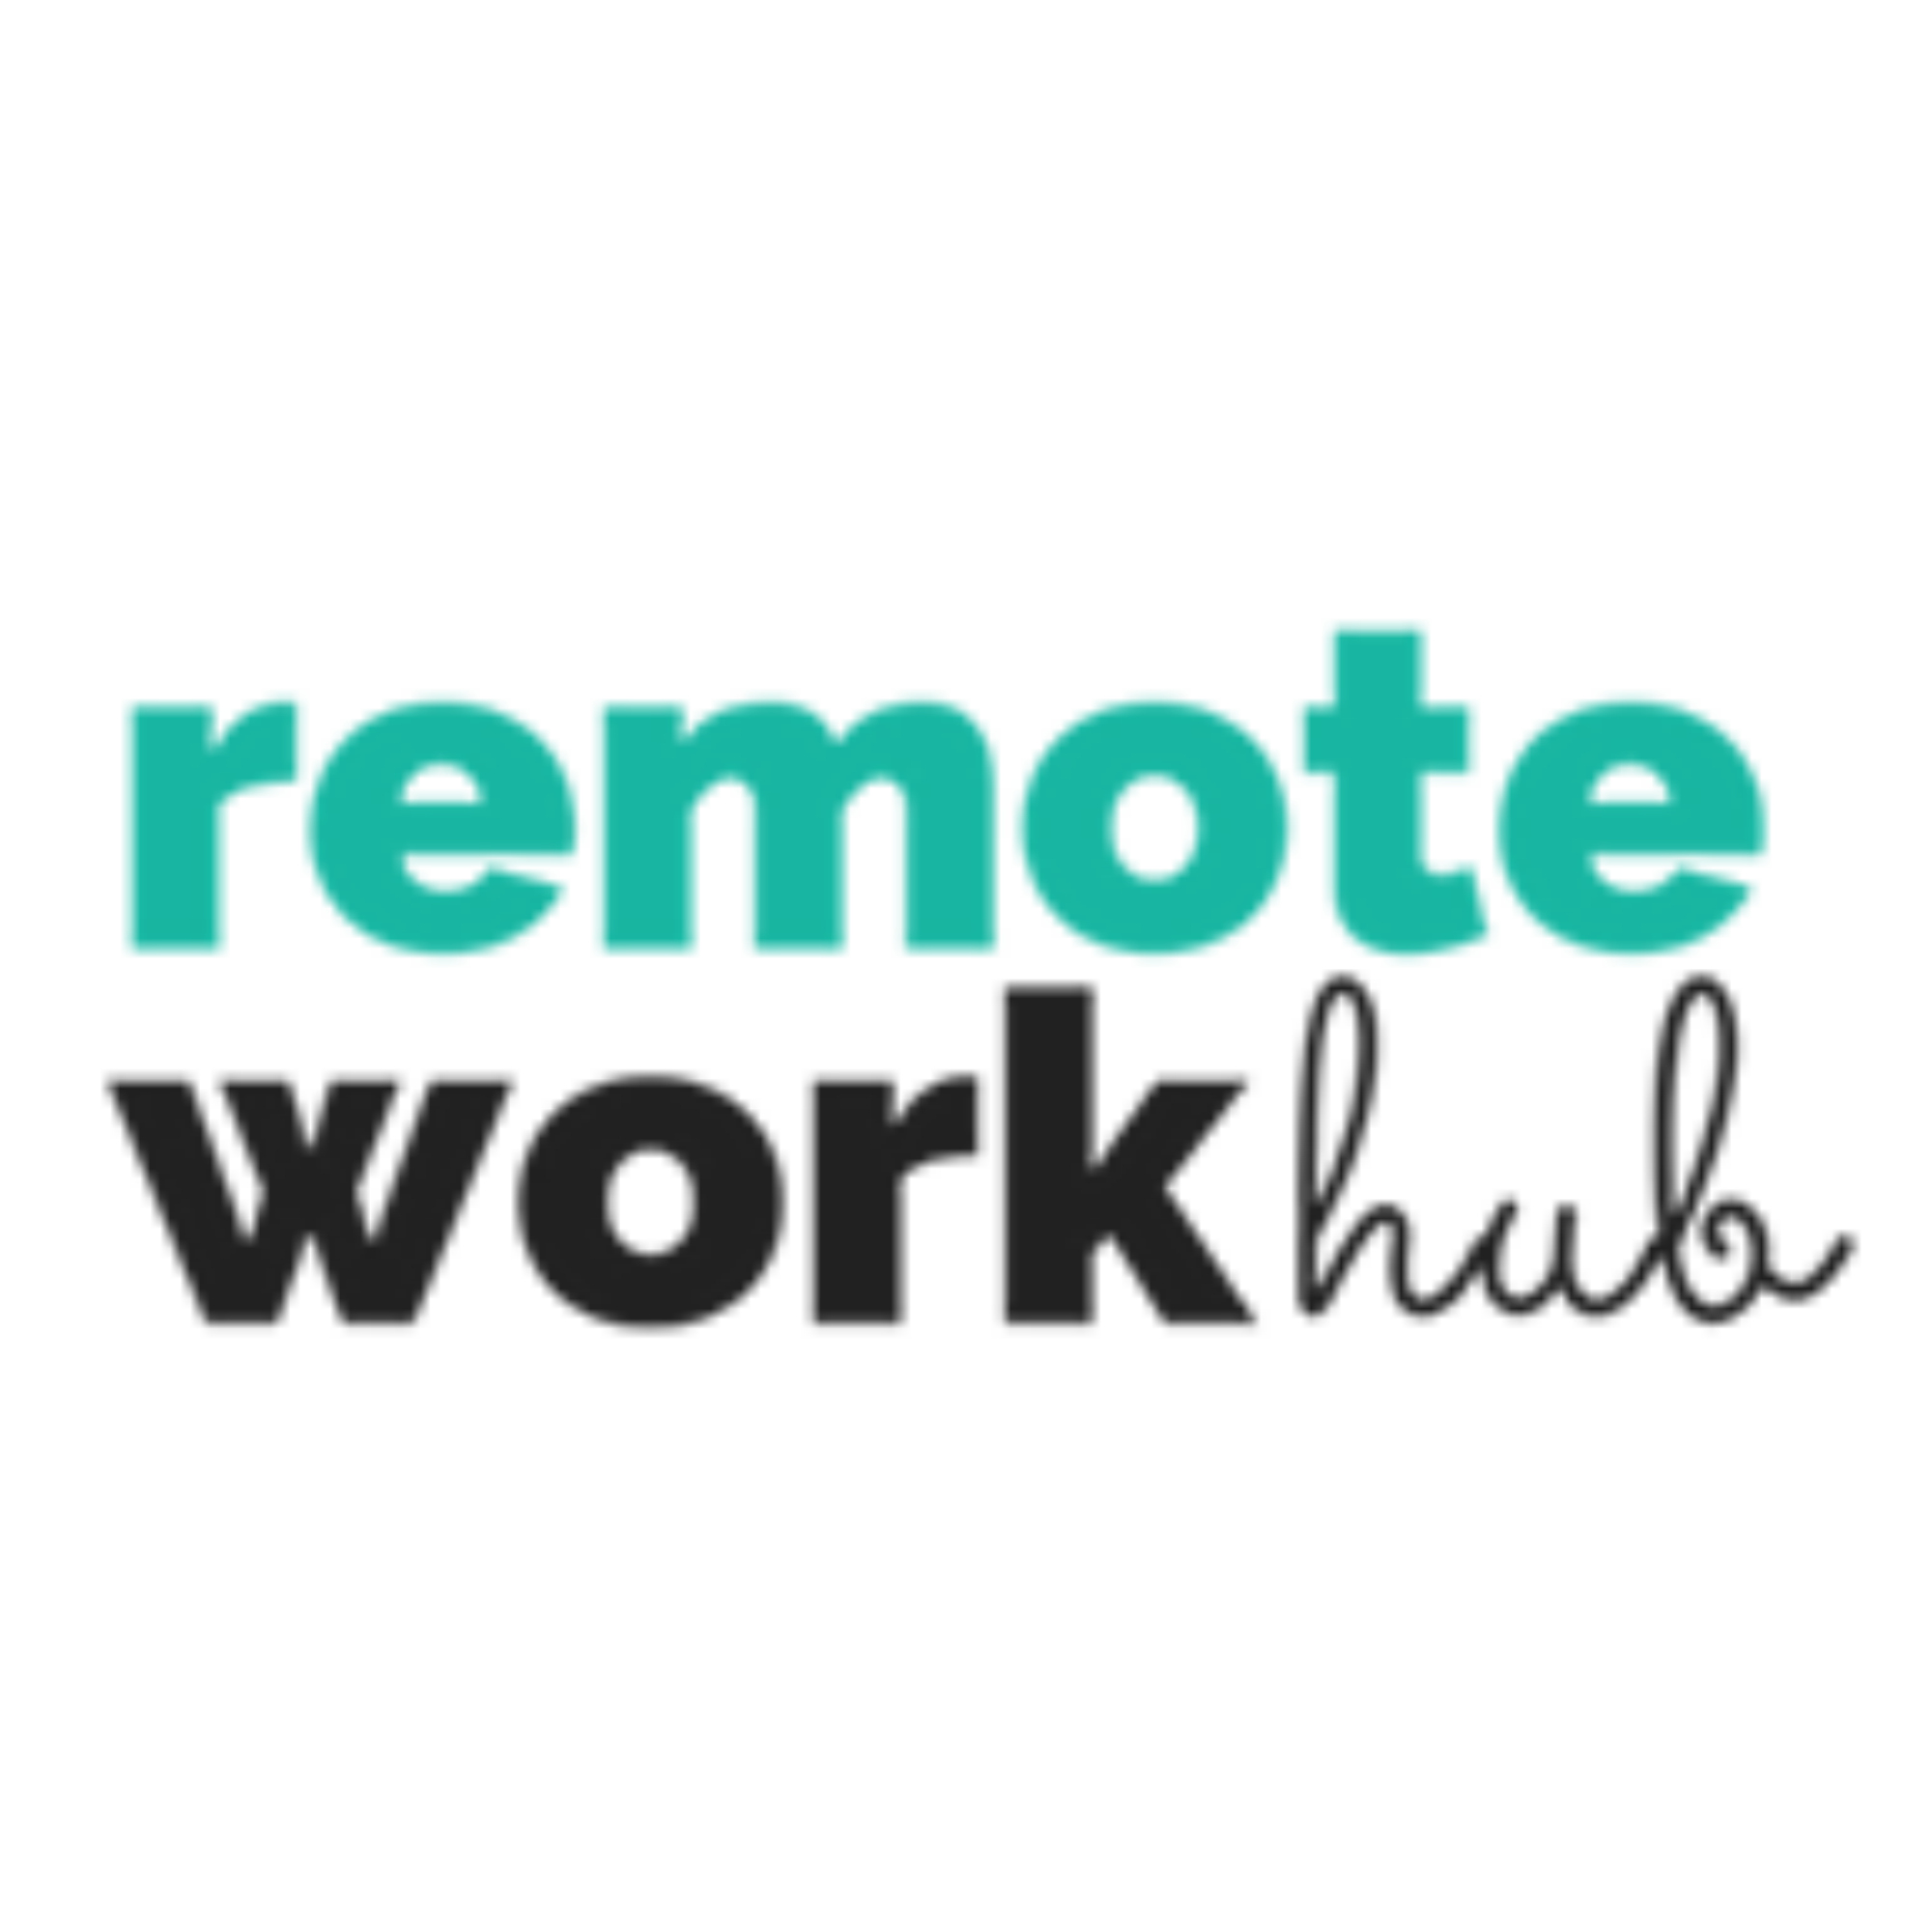 Remote-Work-Hub-logo.jpg